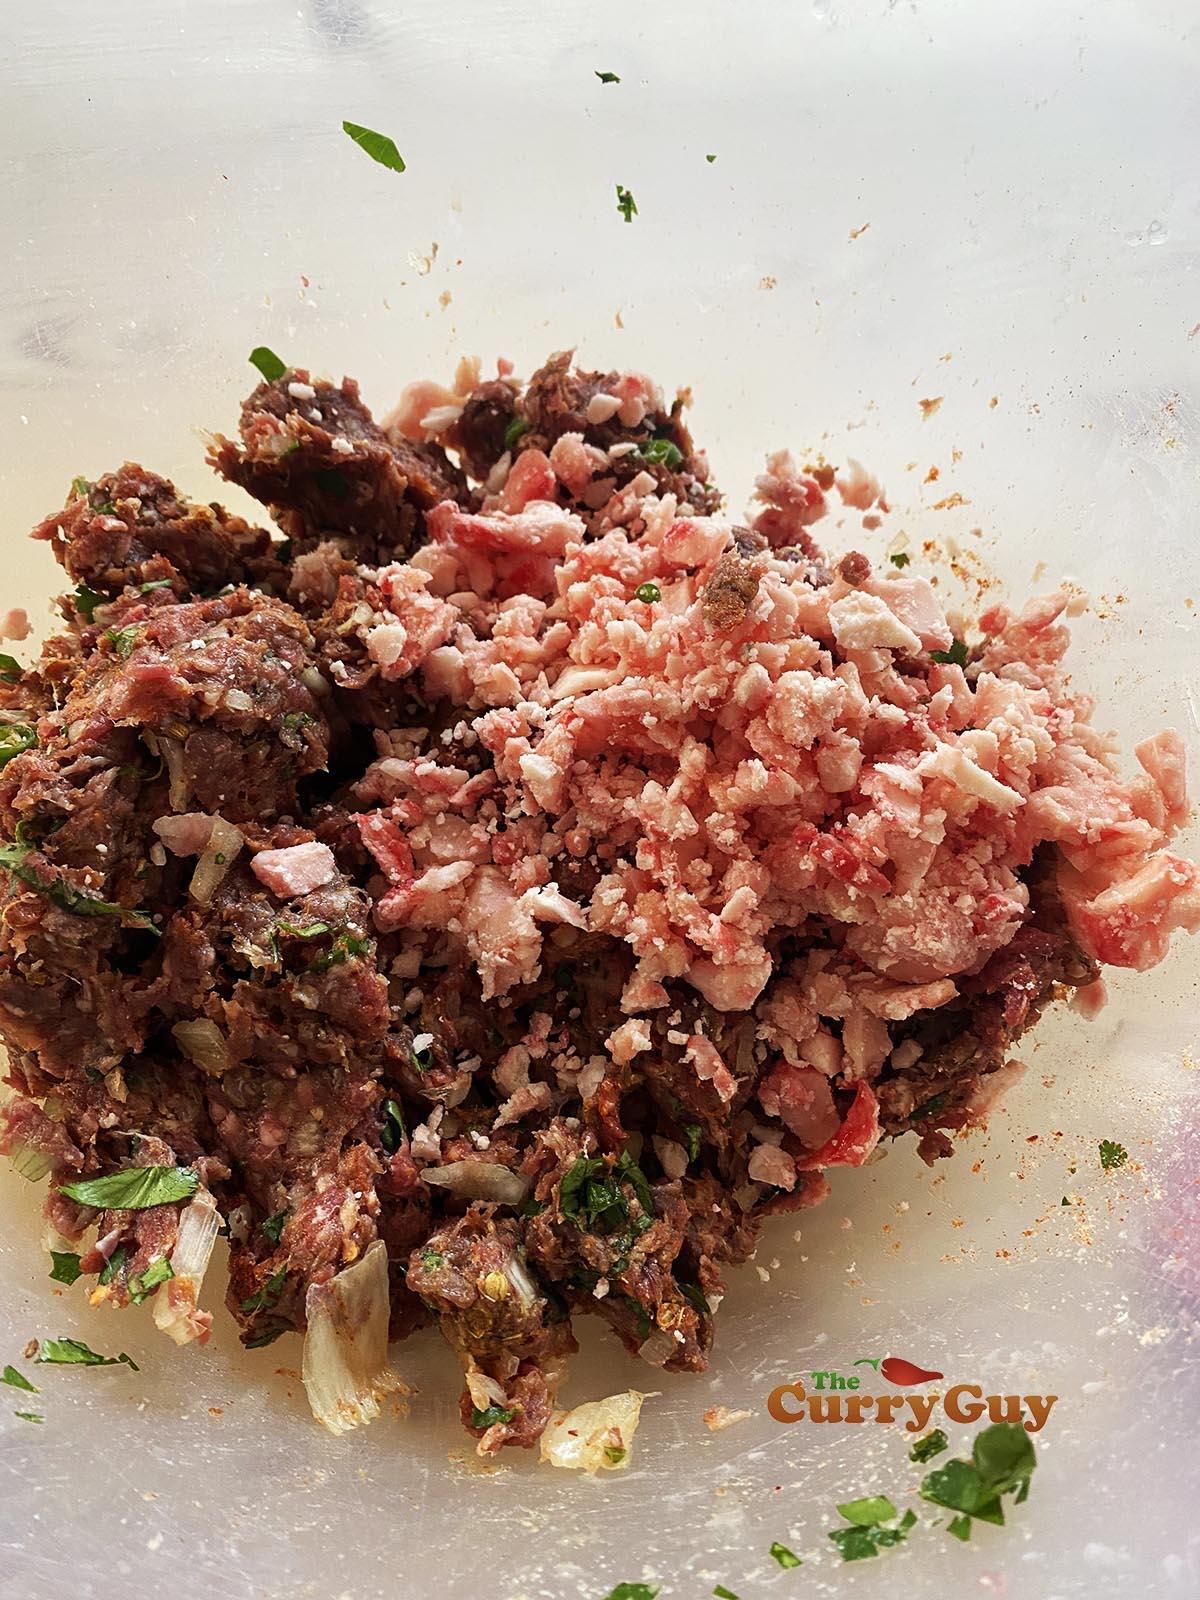 Adding bone marrow to kebab meat